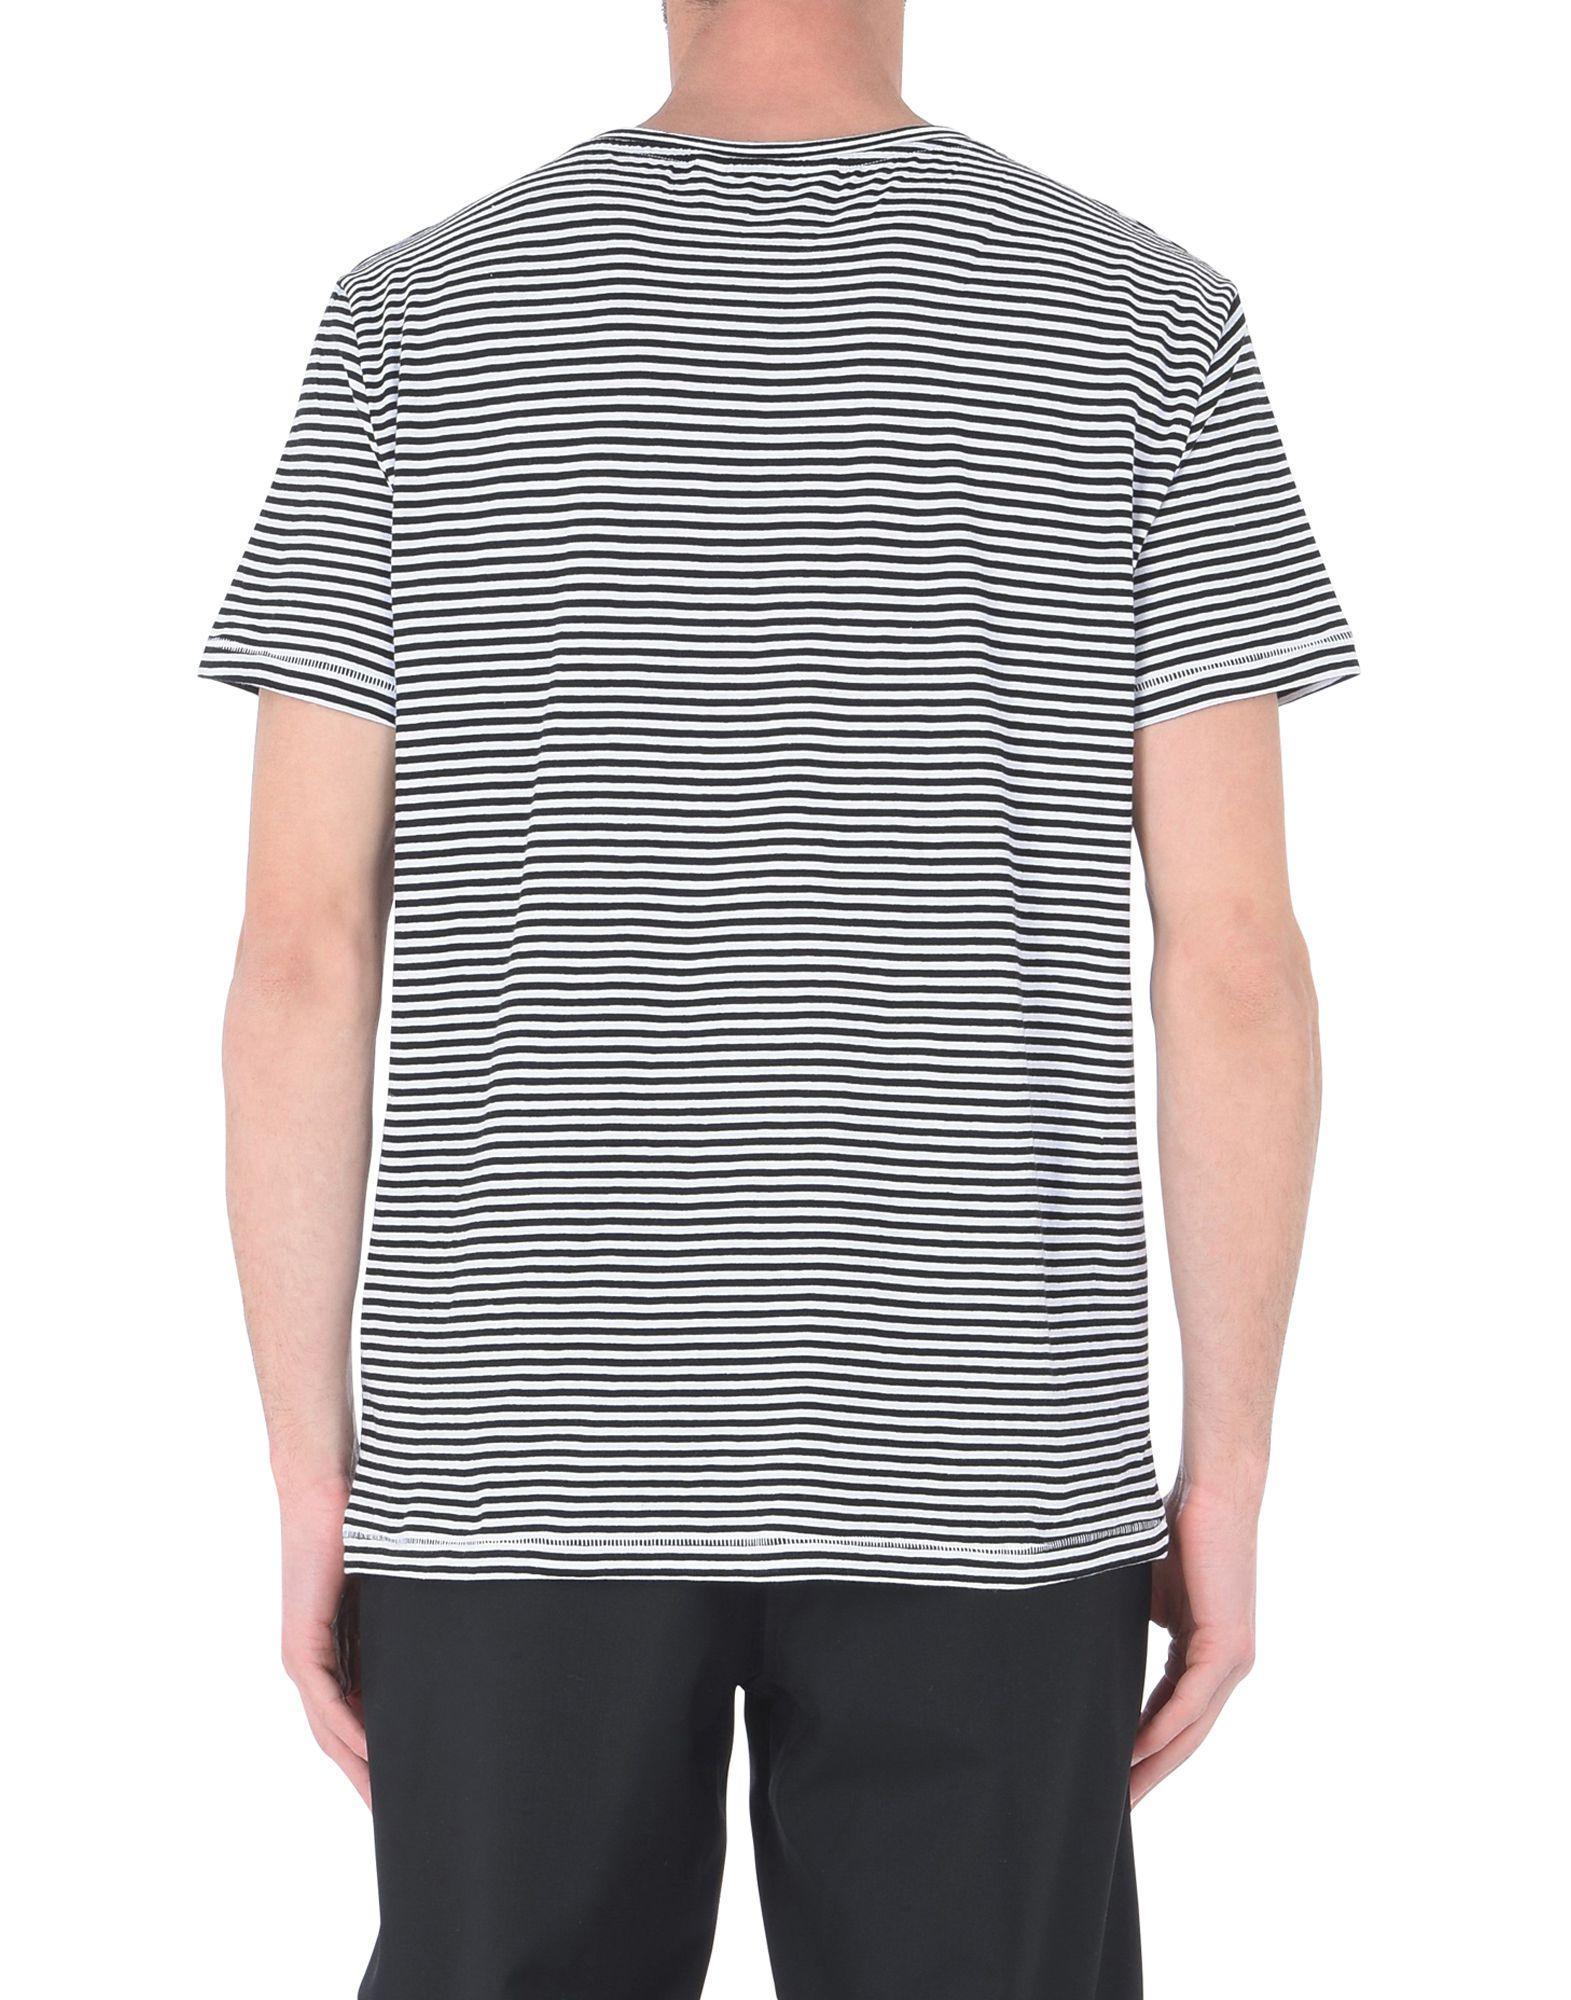 T-Shirt Eleven Paris Naris M - Uomo - 12178290IX 12178290IX 12178290IX 613e57